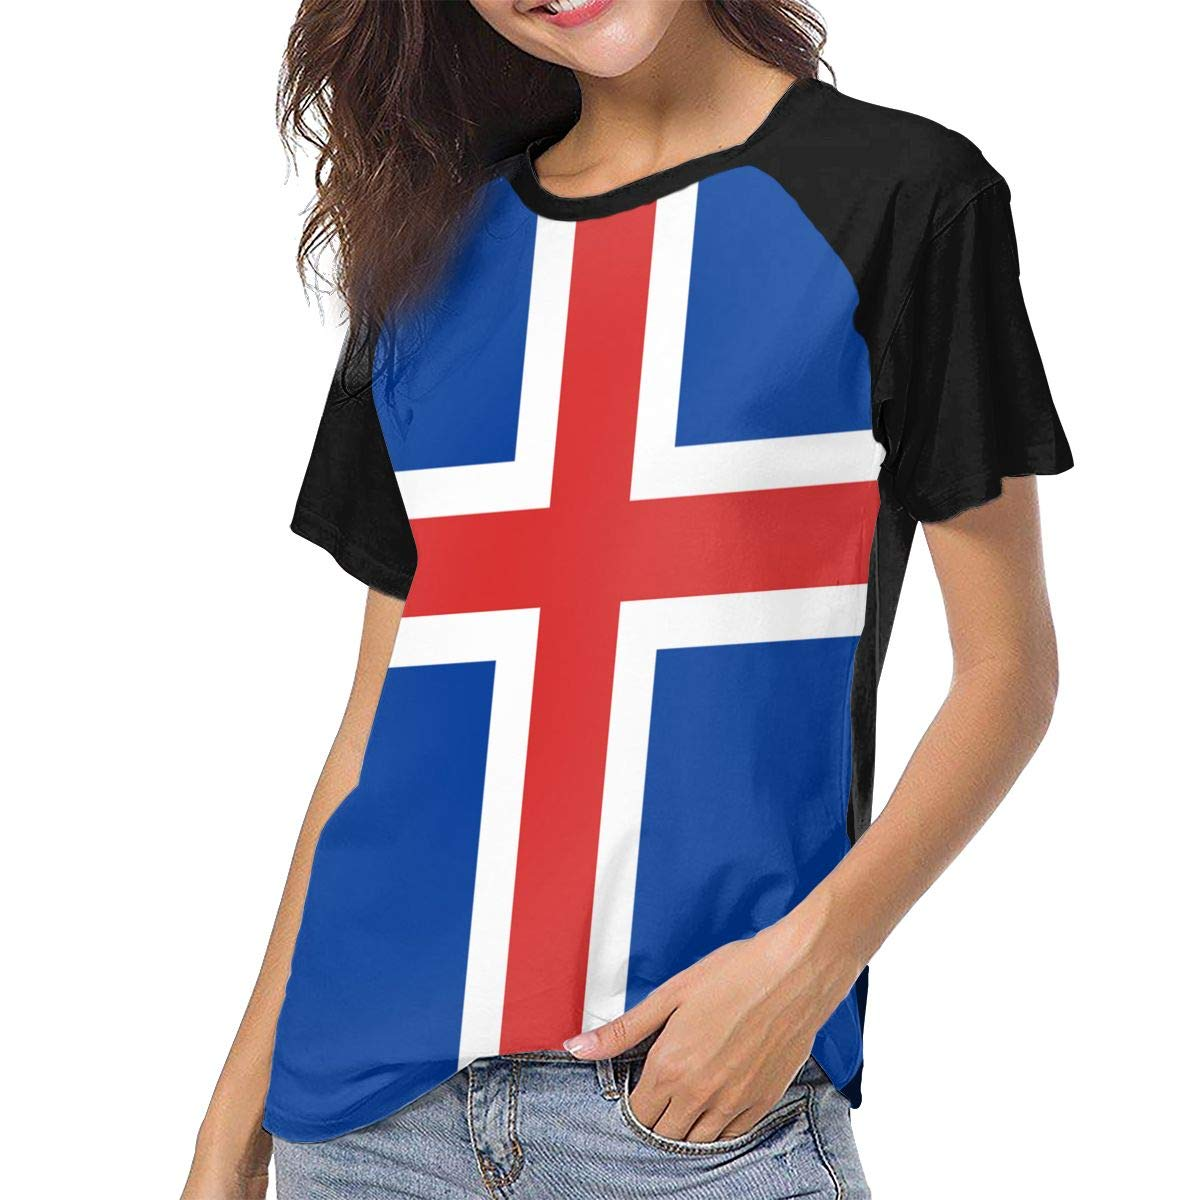 IRON1974 Womens The Icelandic Flag Short Sleeve T-Shirt Baseball Tees